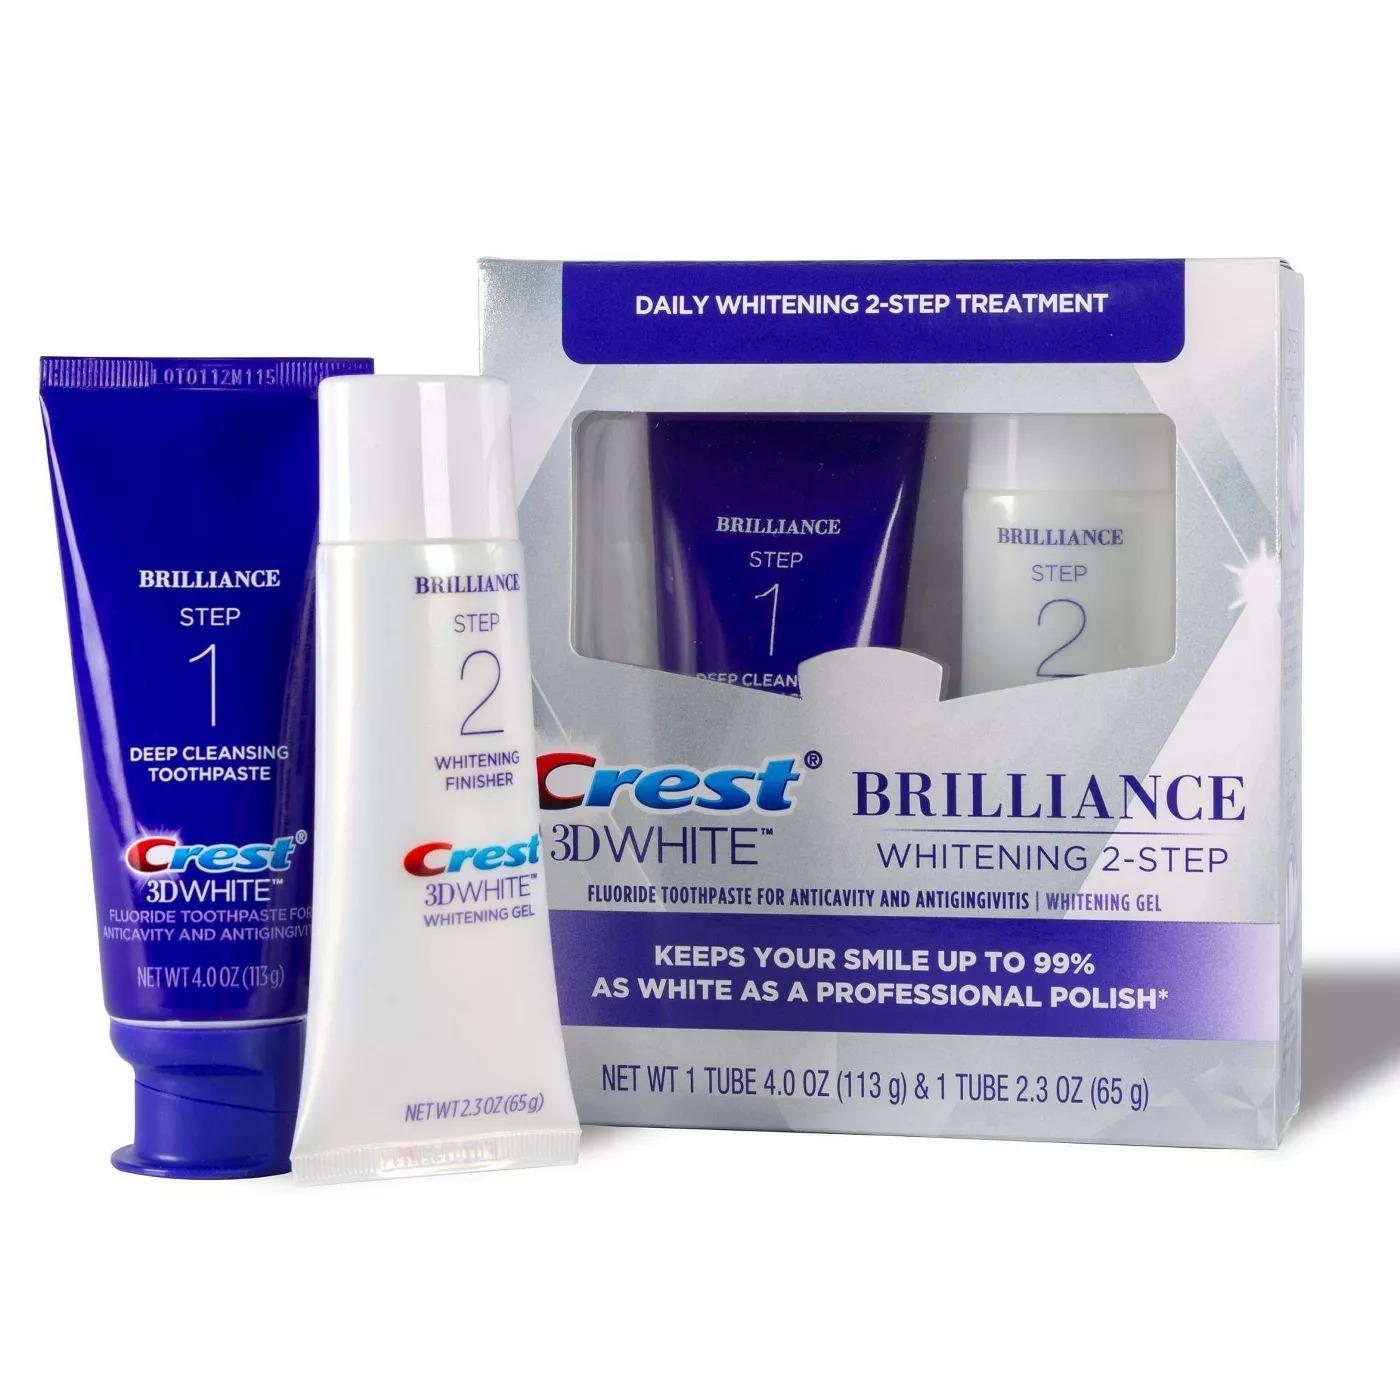 Crest 3D White Brilliance 2 Step Kit